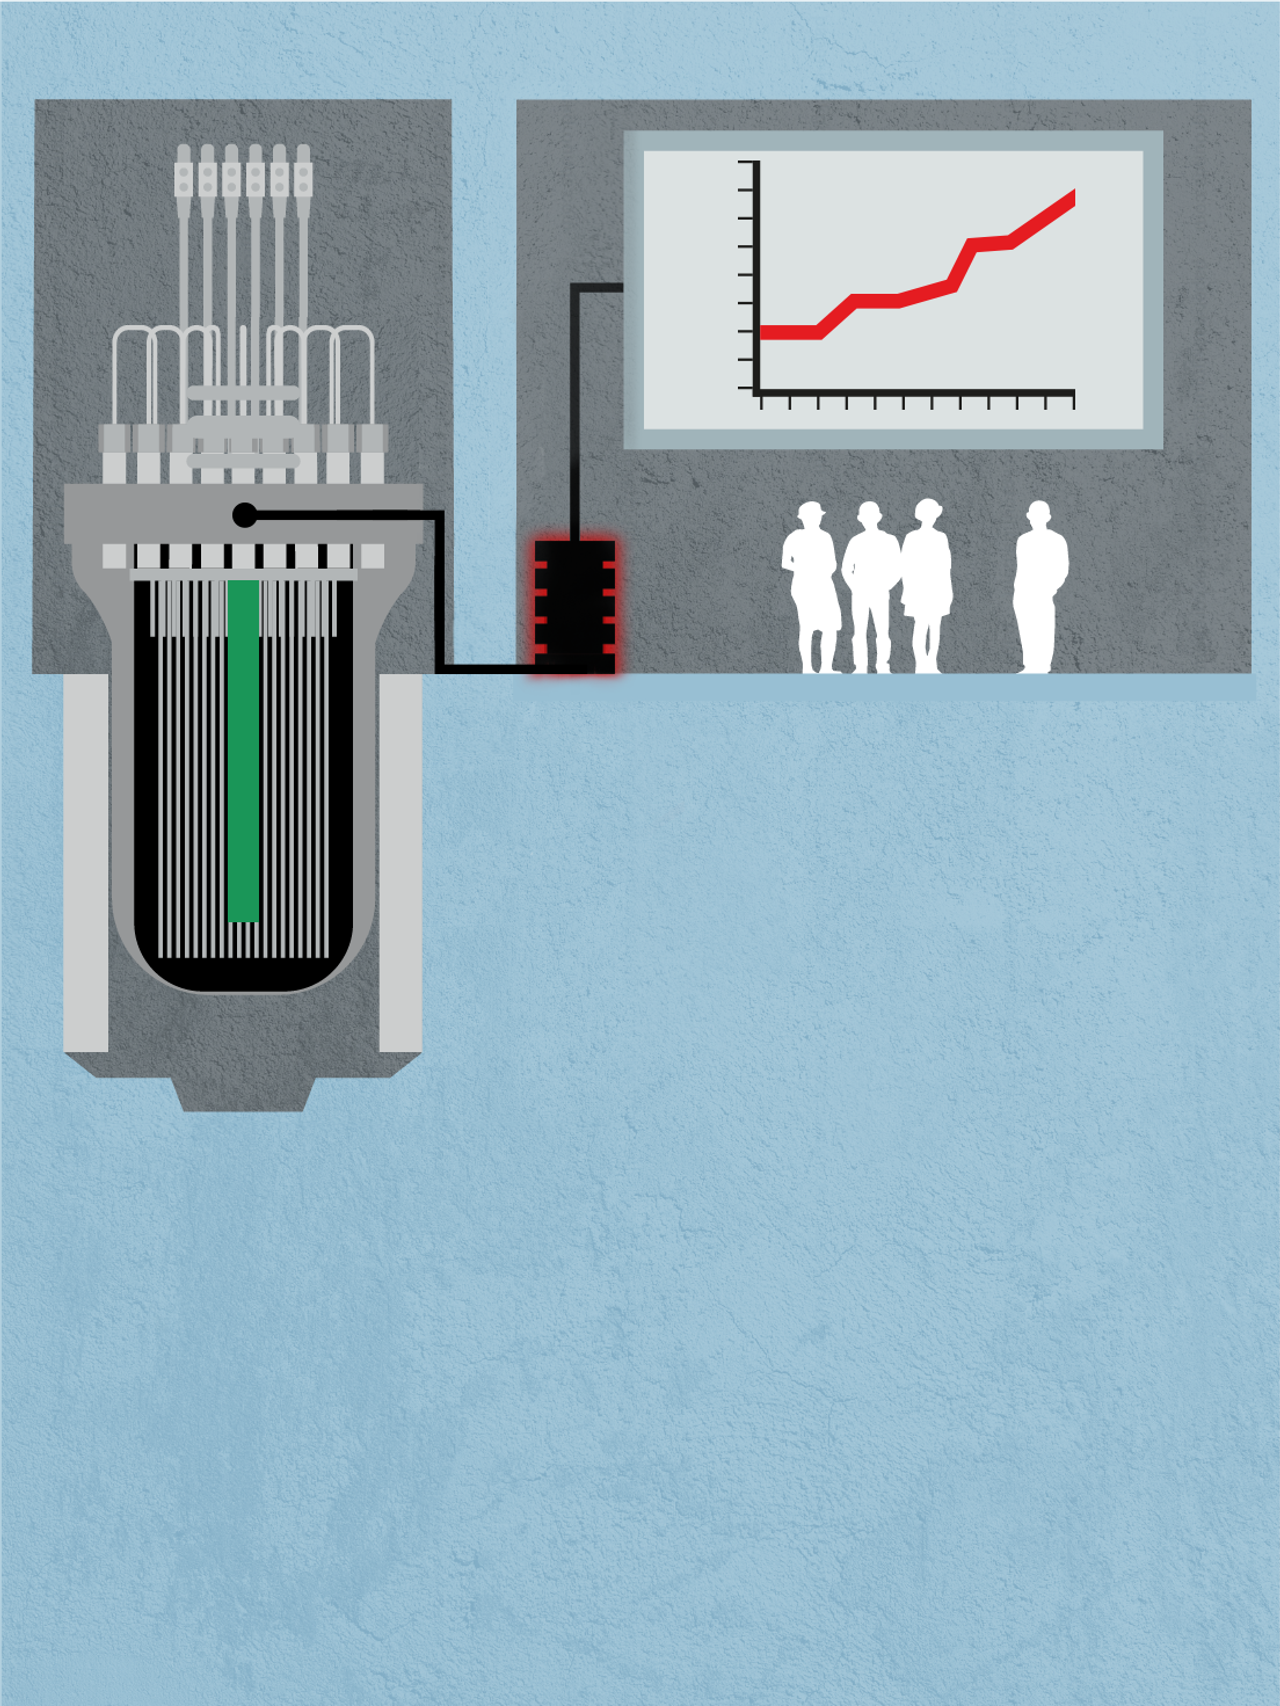 Atomreaktor illustrasjon del 3